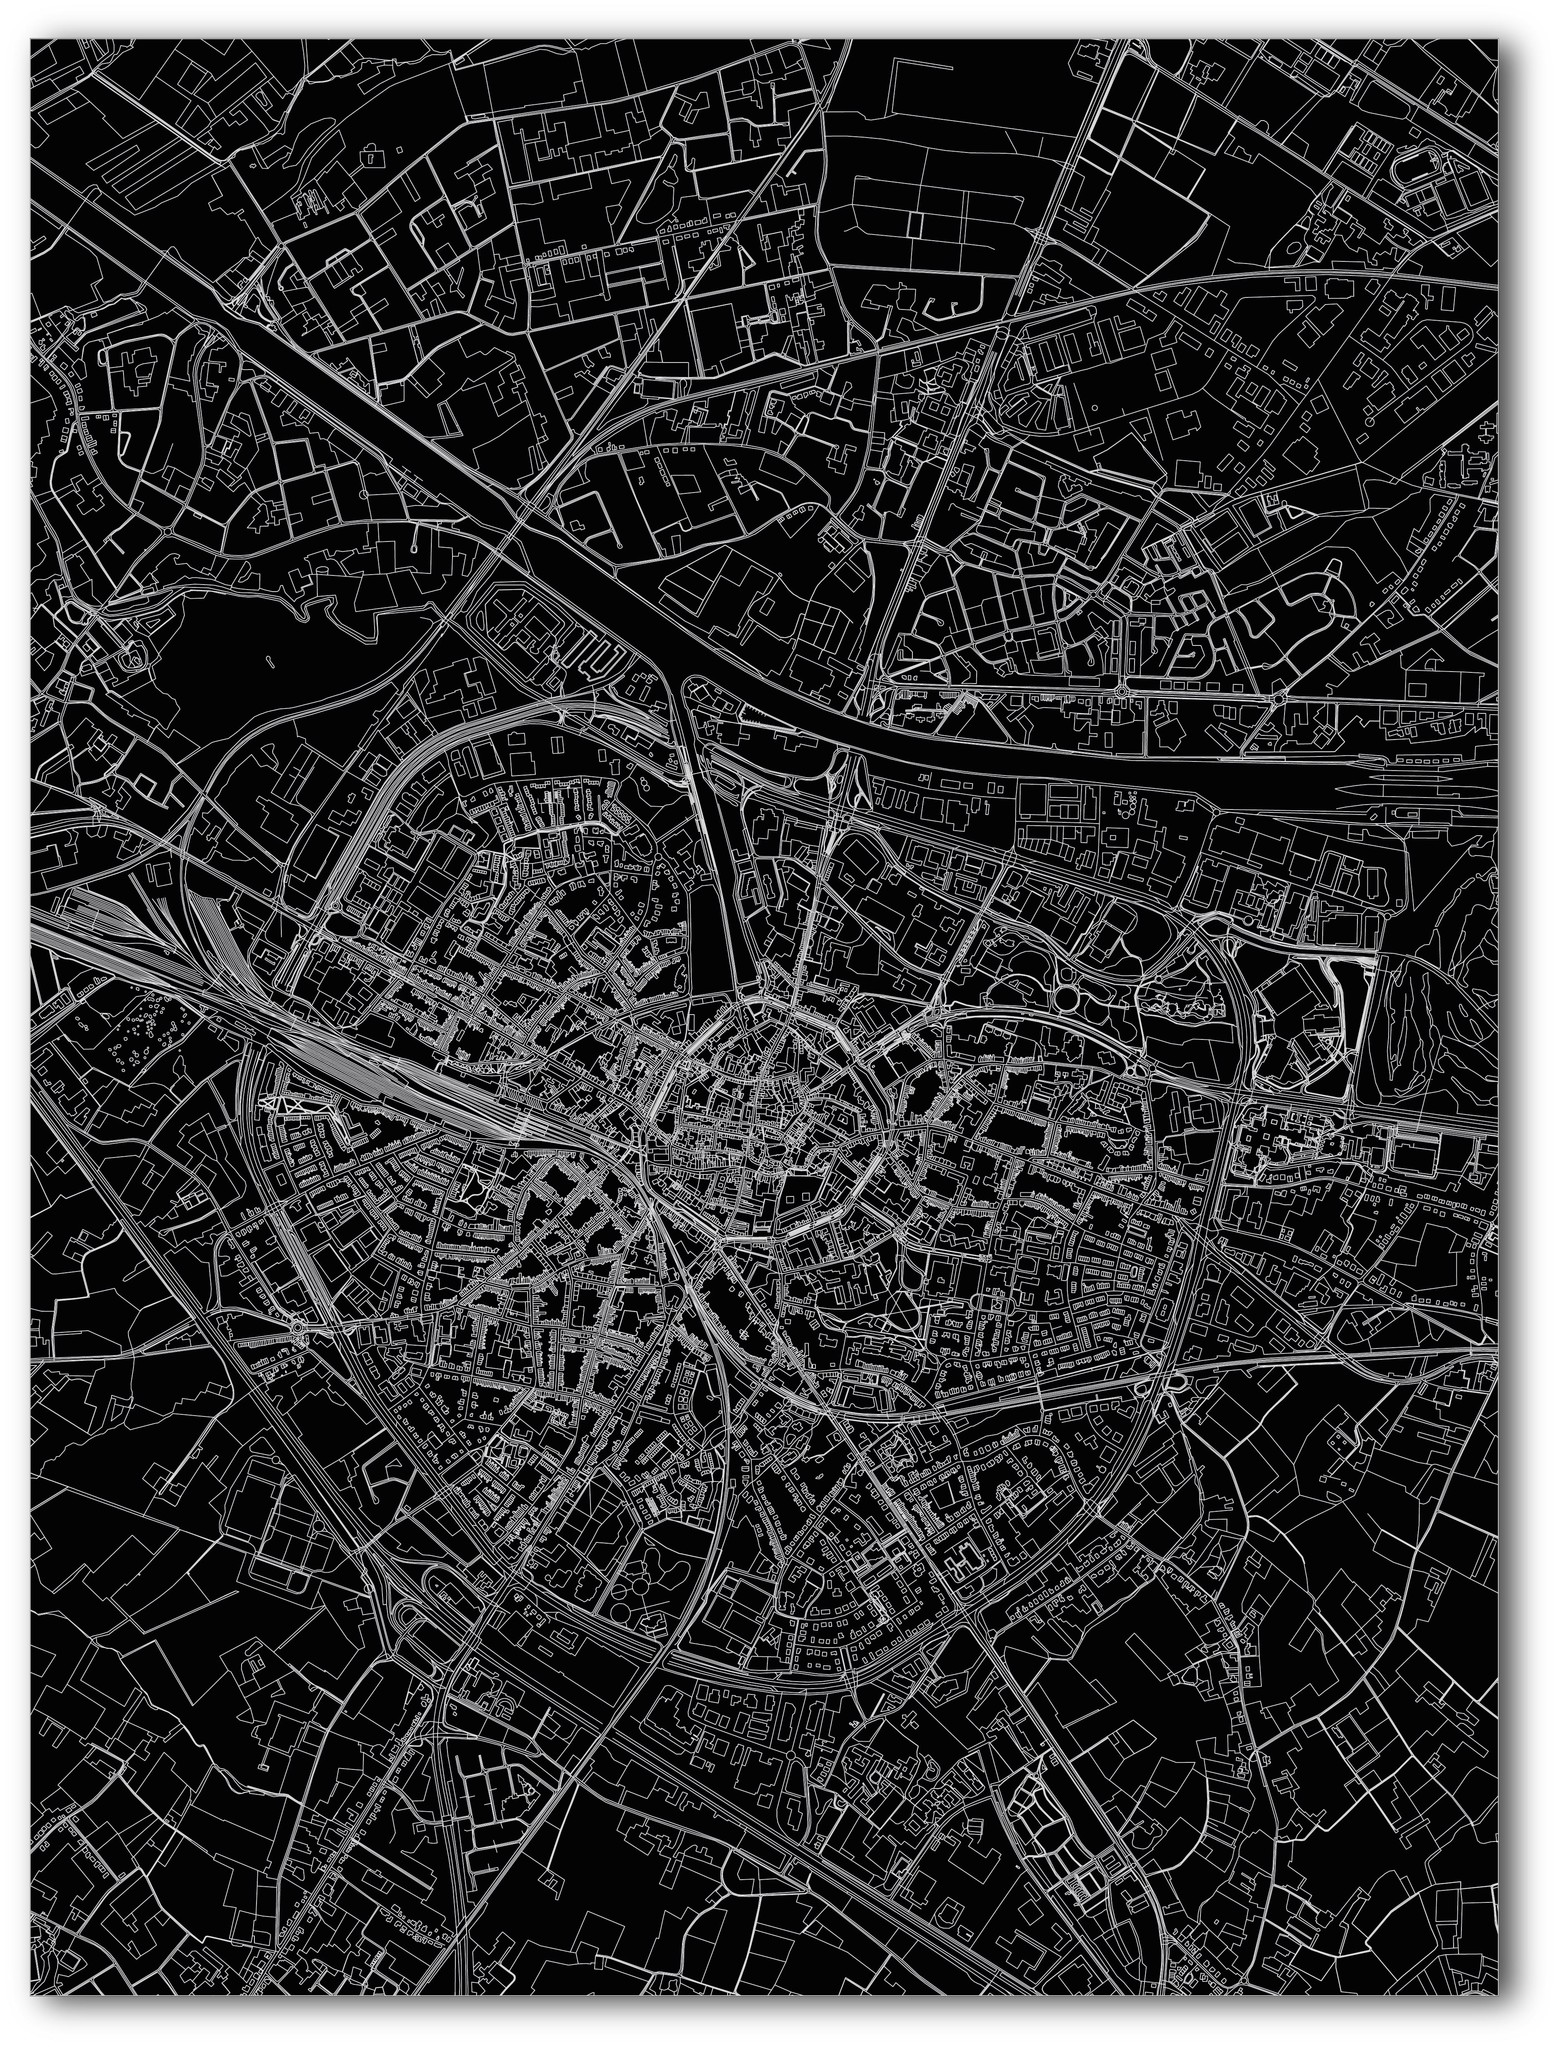 Stadtkarte Hasselt | Aluminium Wanddekoration-3